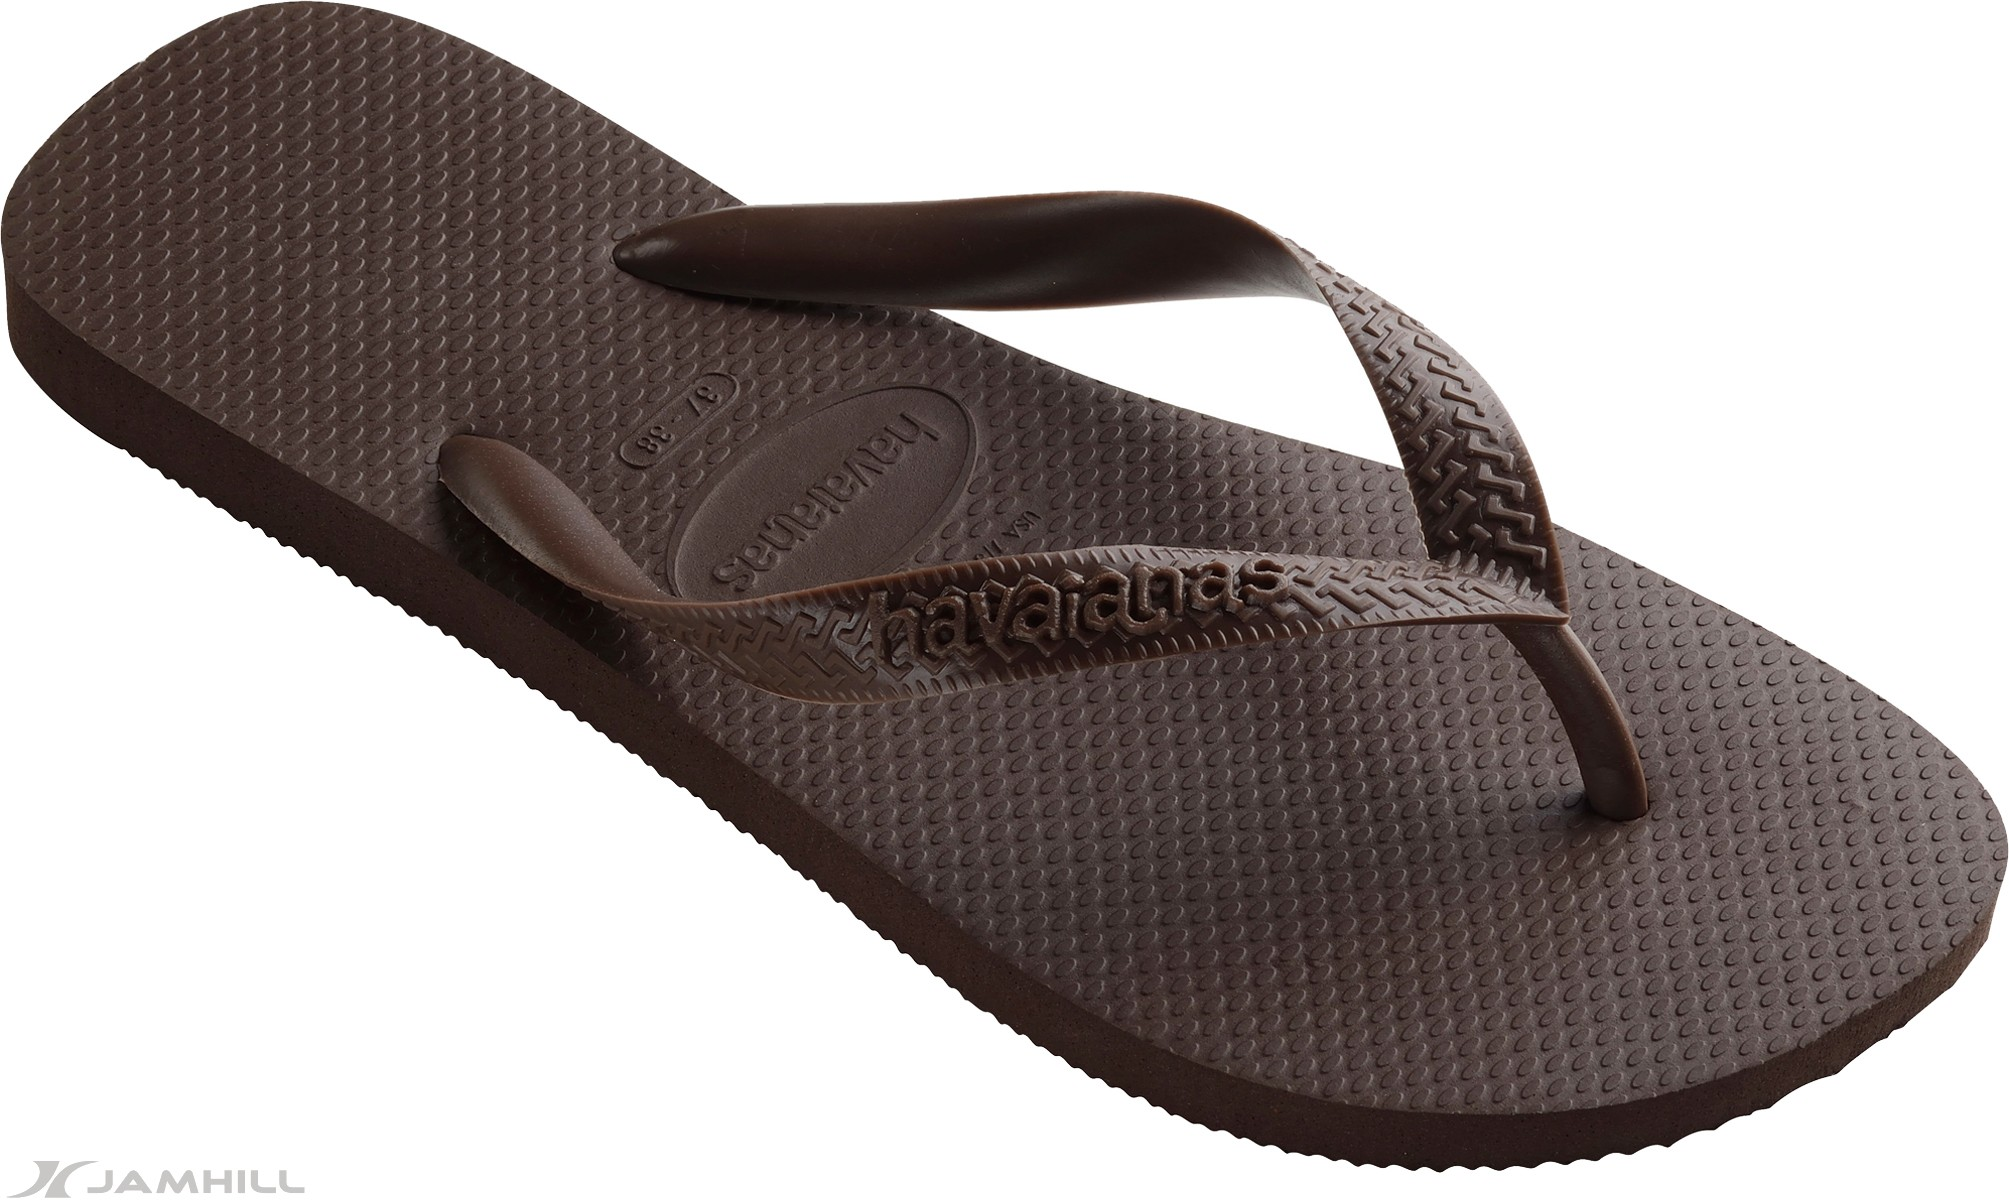 6ae9cf337 Havaianas Top flip flops. The original unisex Brazil sandals. New ...